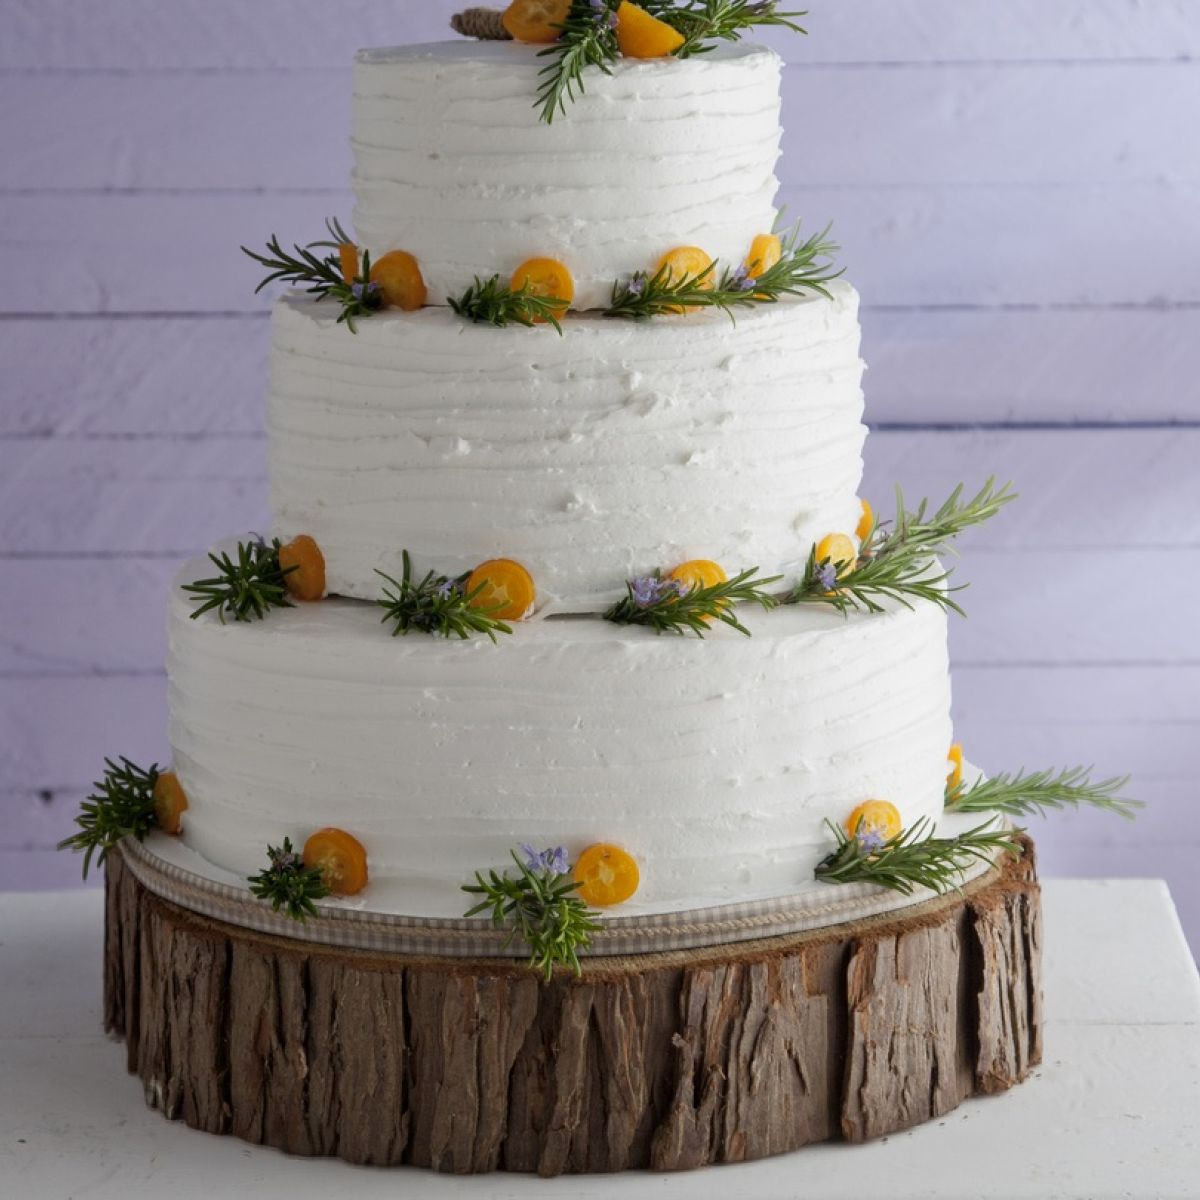 How To Make A Wedding Cake.Genoise Sponge Chocolate Mousse Wedding Cake